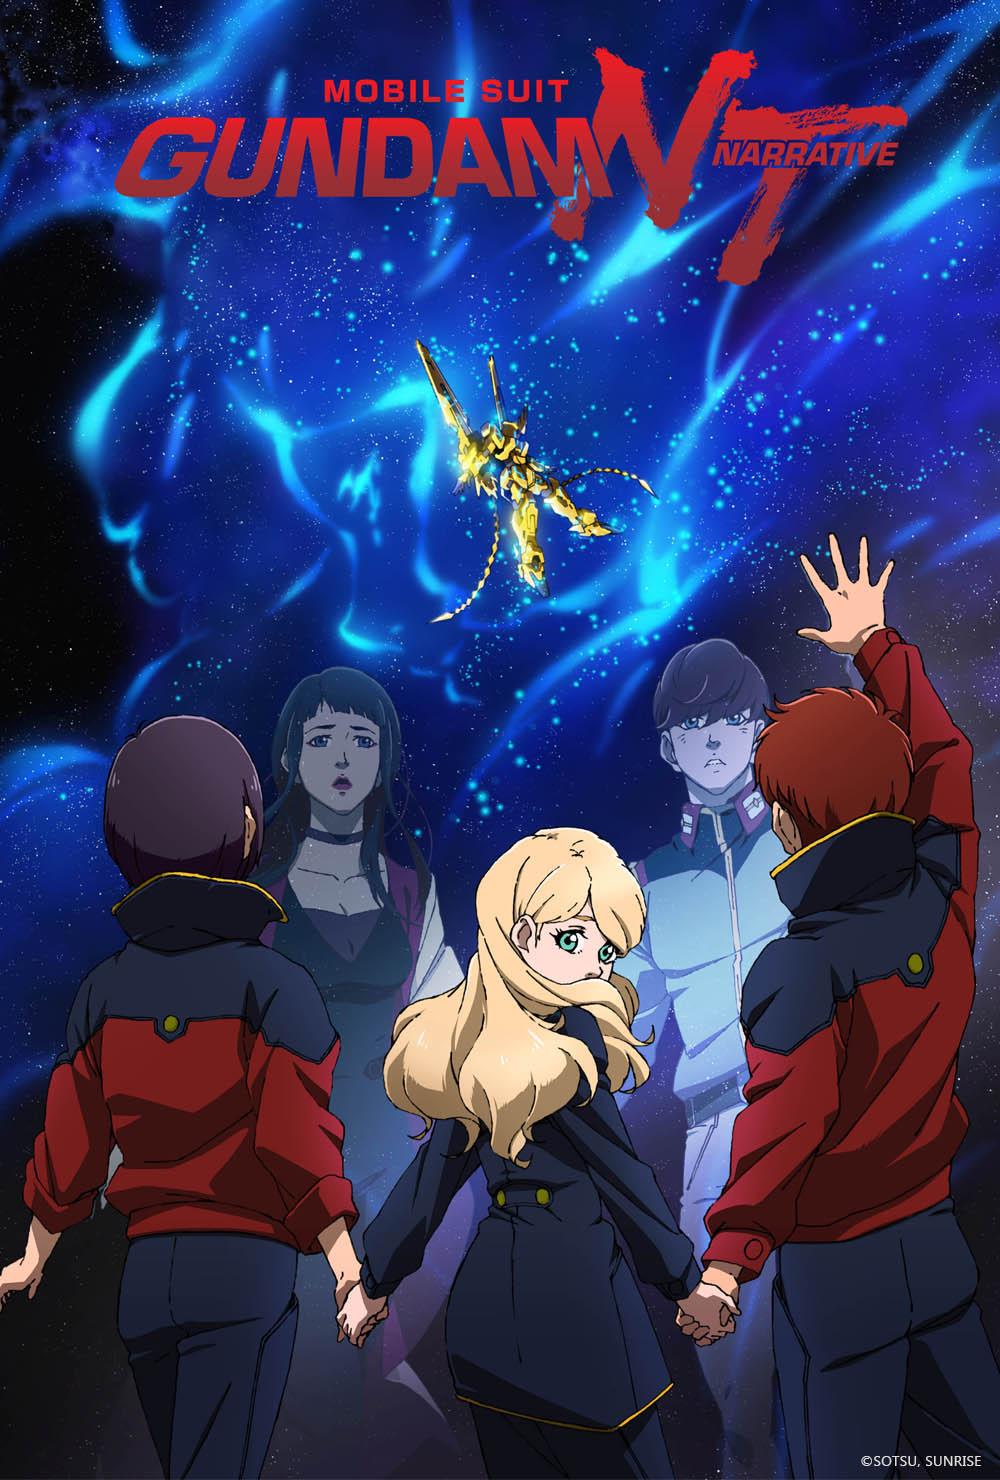 NekoPOP-Mobile-Suit-Gundam-NT-Fathom-2019-A